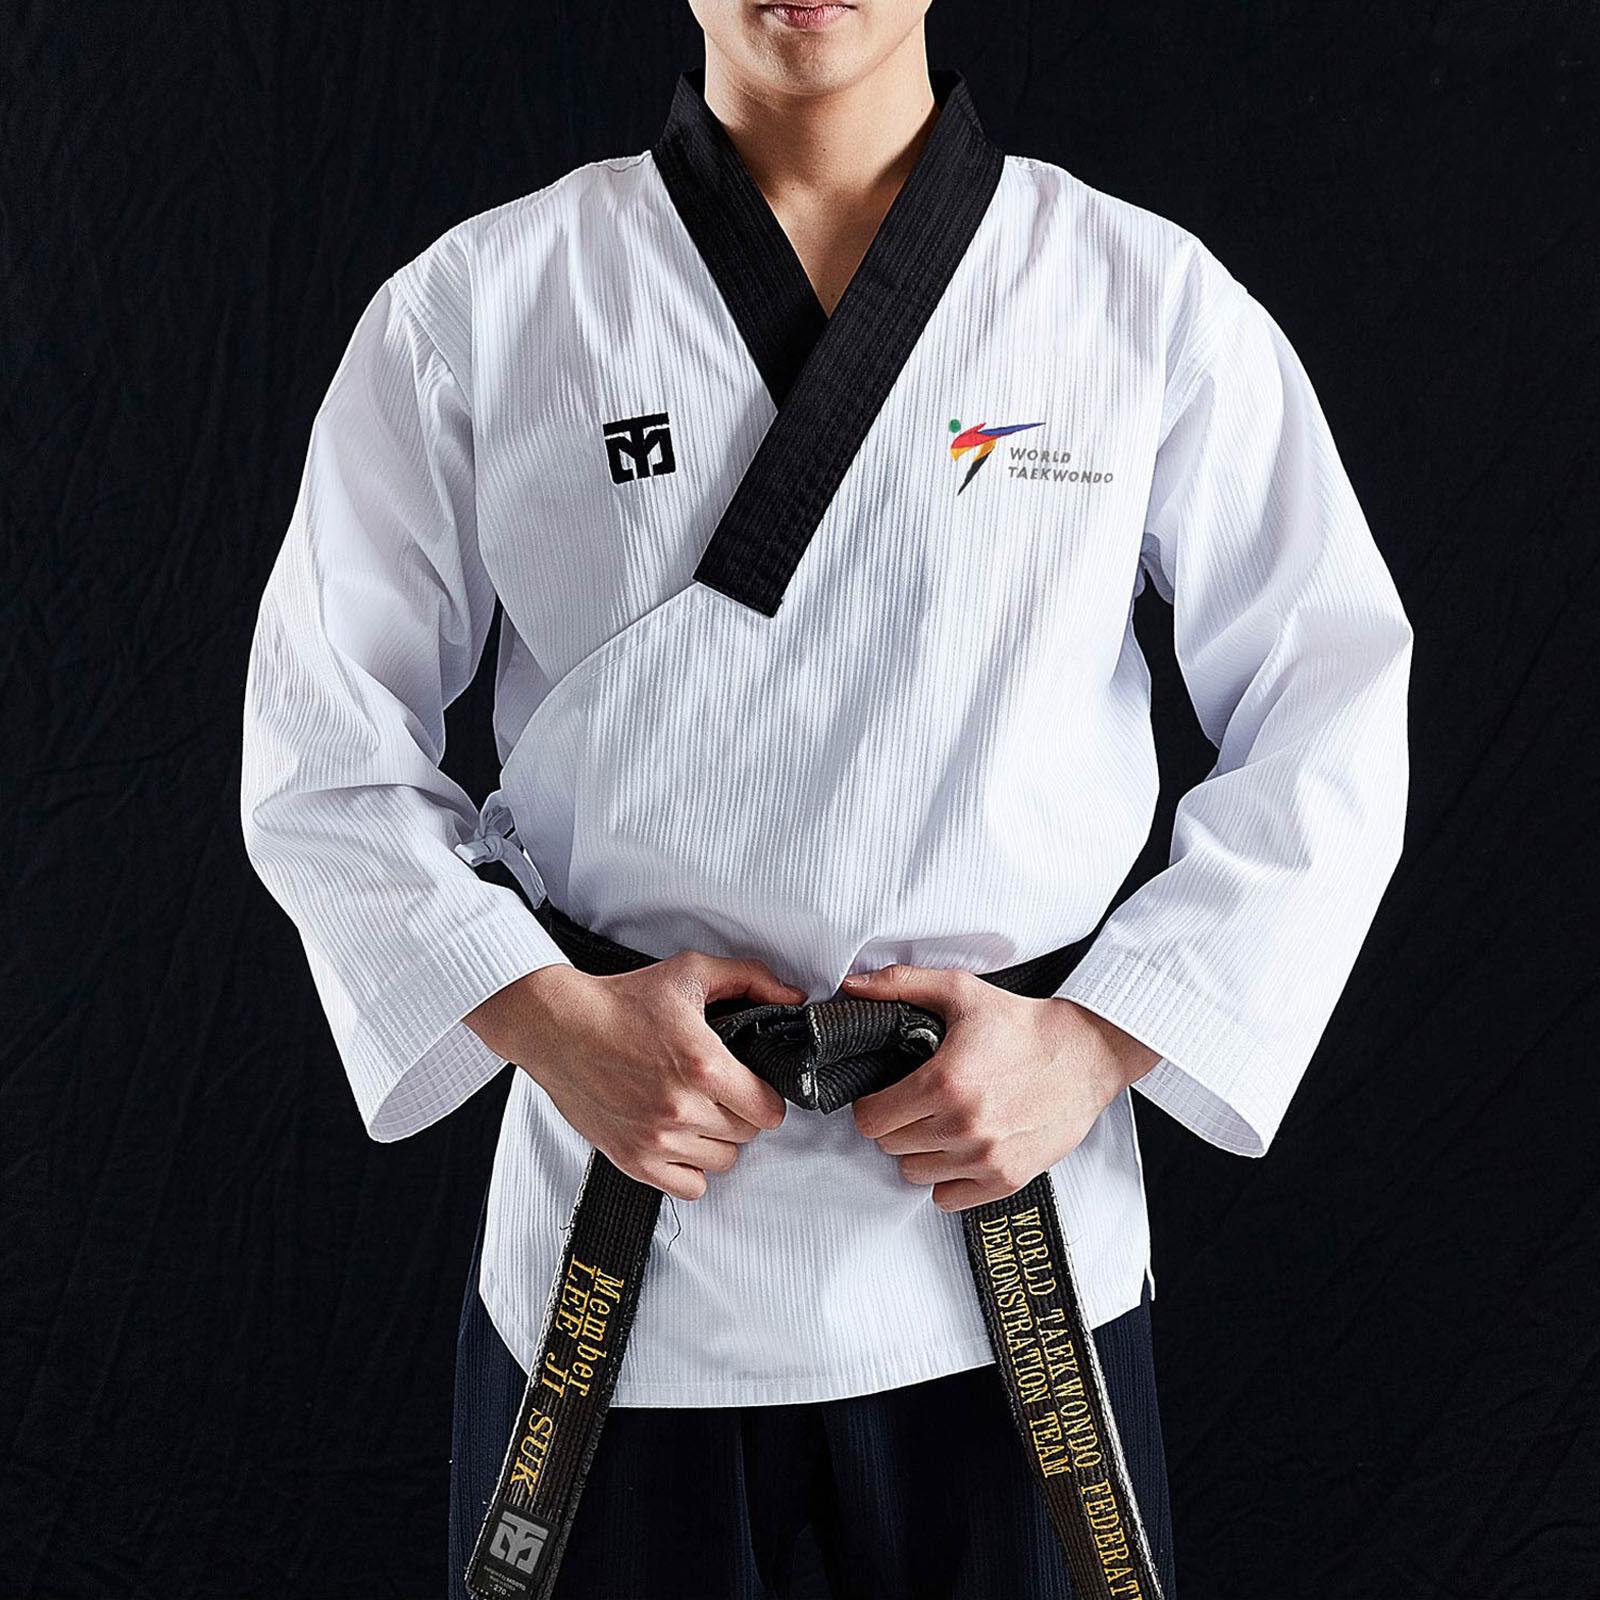 Professional Poomsae Suits Mooto Taebek Male Dan Holder Uniform  New WT Logo MMA  discount low price